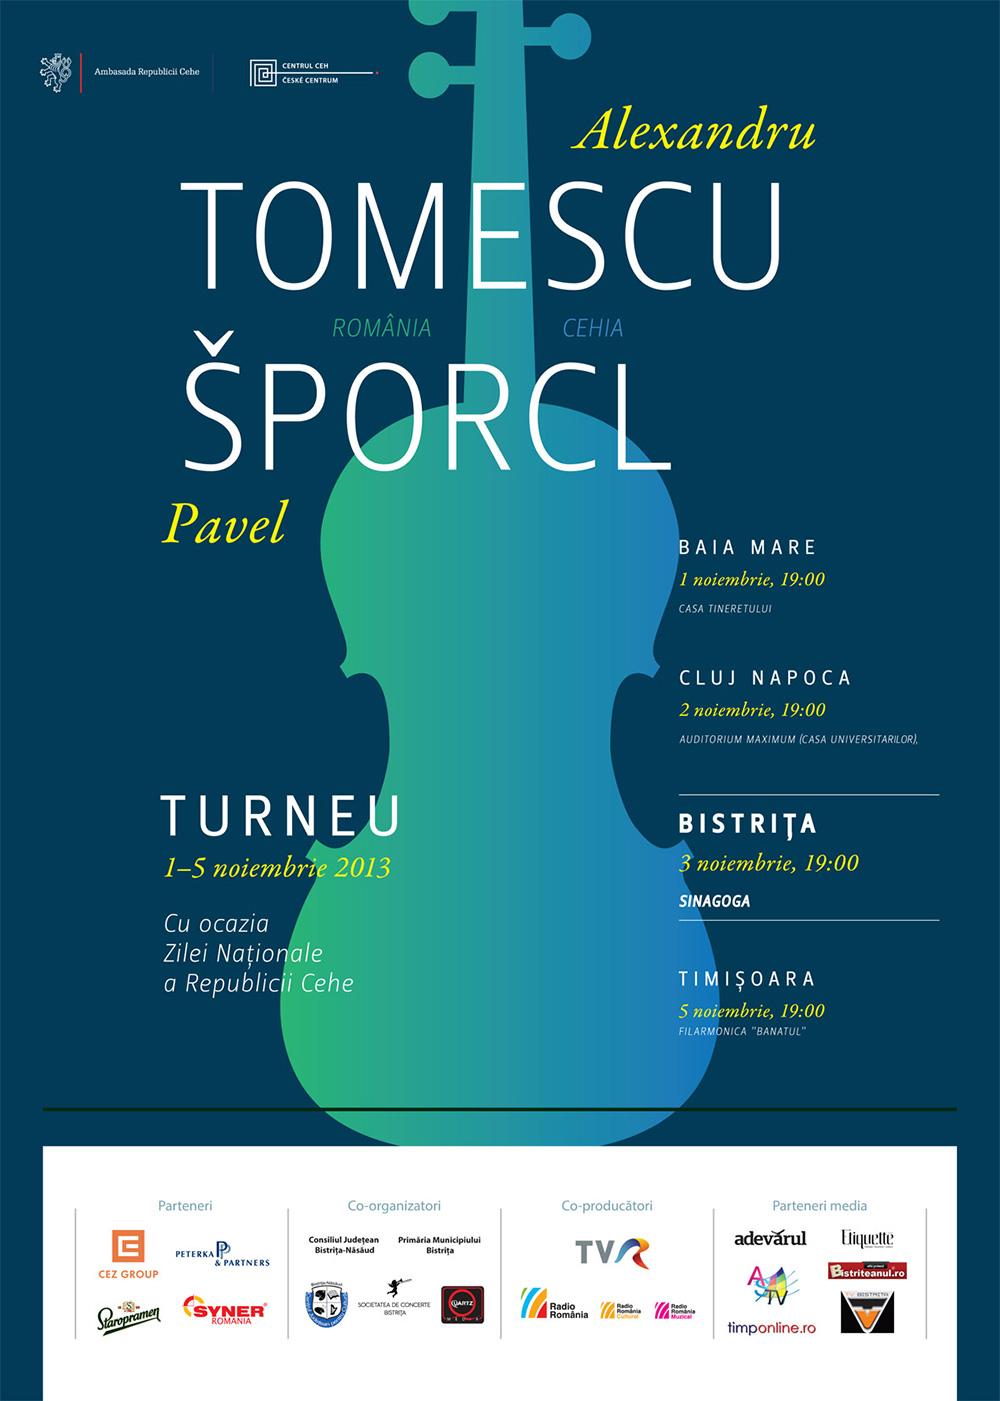 Poster Alexandru Tomescu Pavel Sporcl